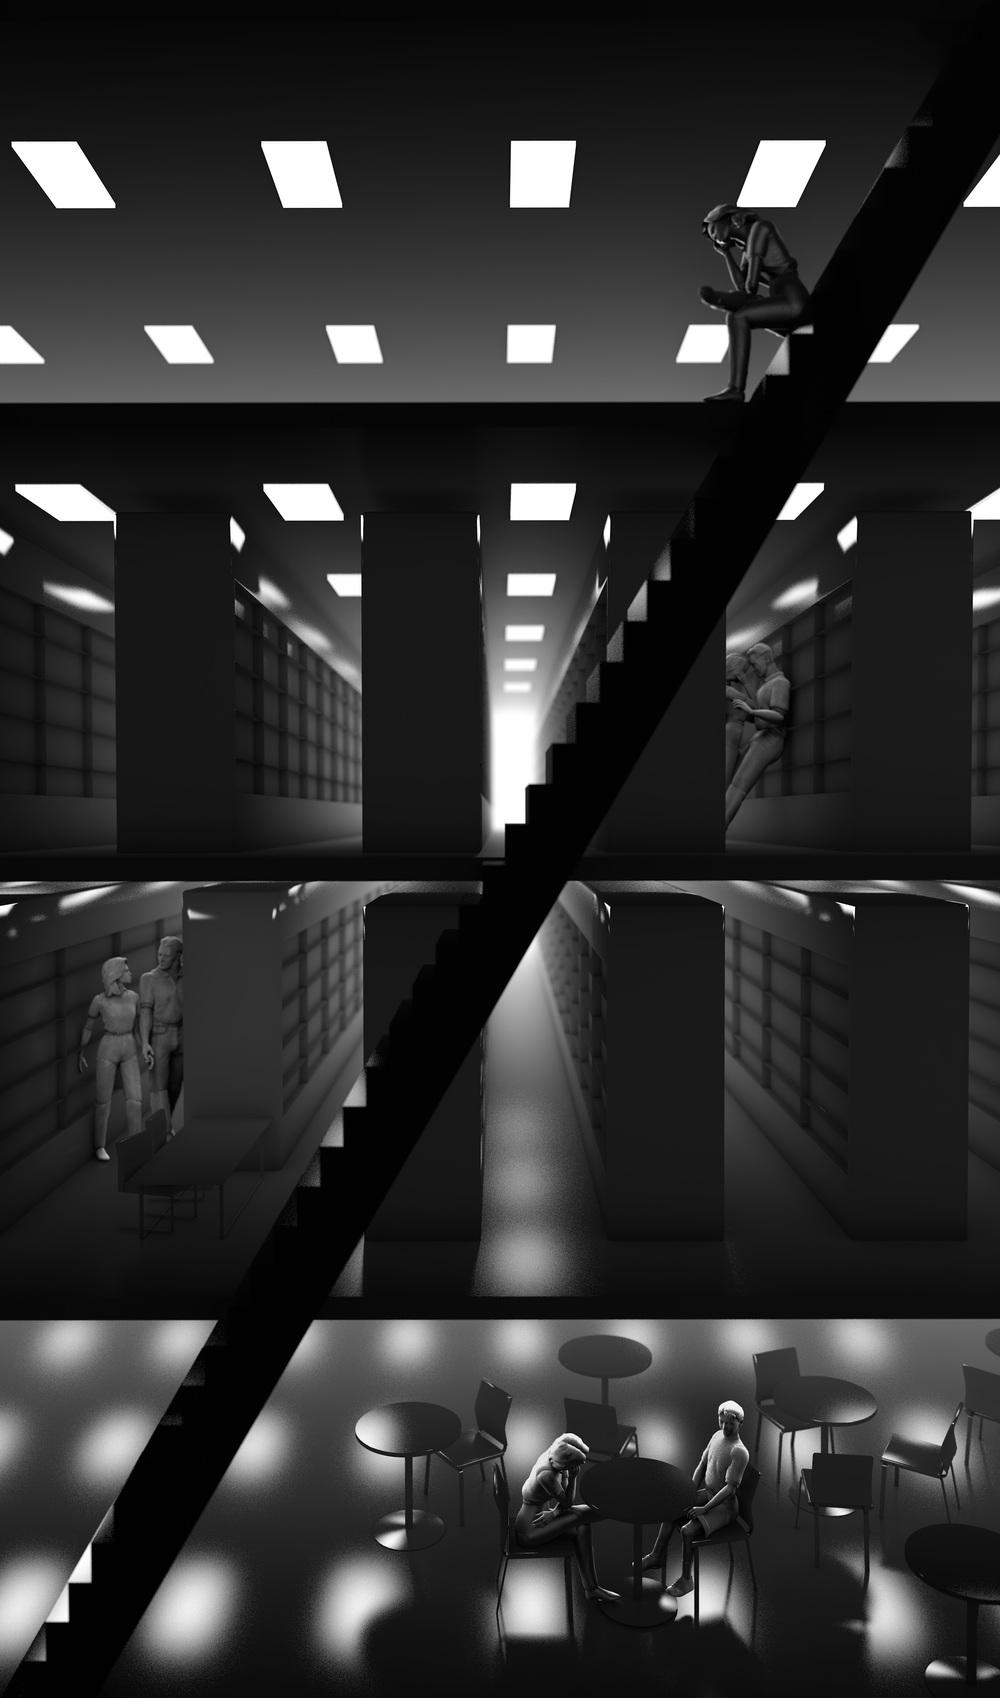 Stacks(final).jpg